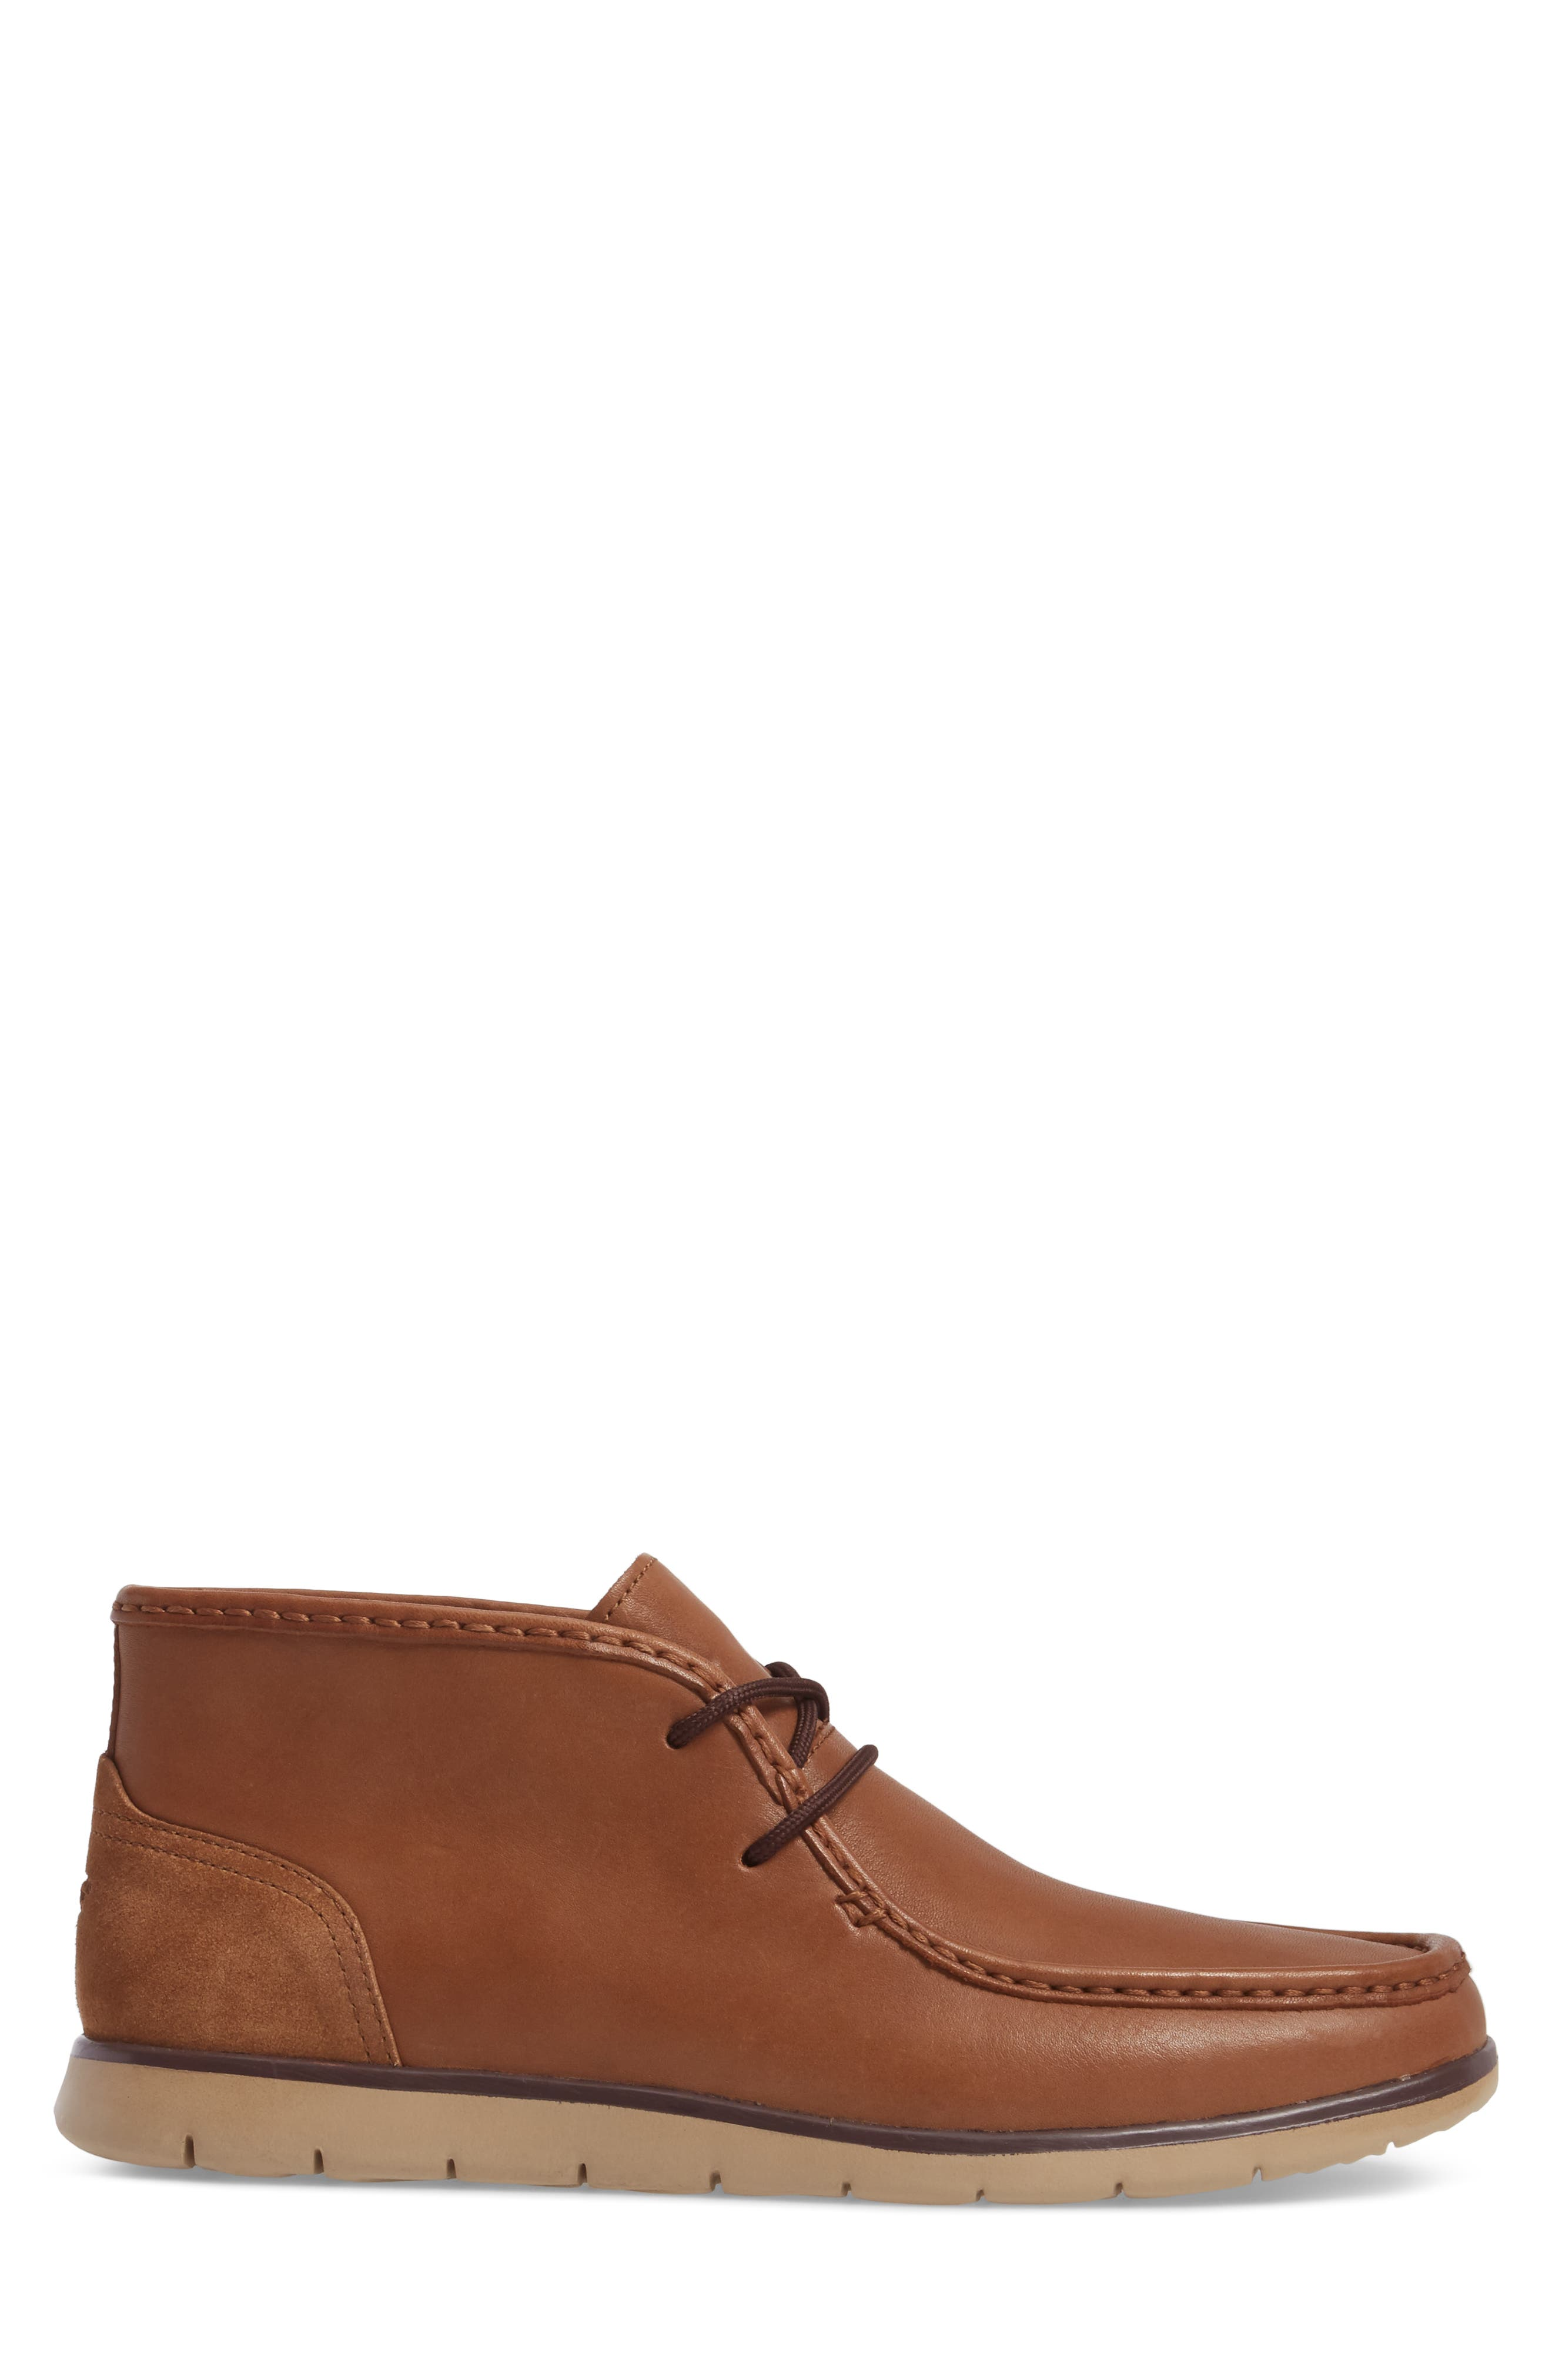 Alternate Image 3  - UGG® 'Hendrickson' Chukka Boot (Men)